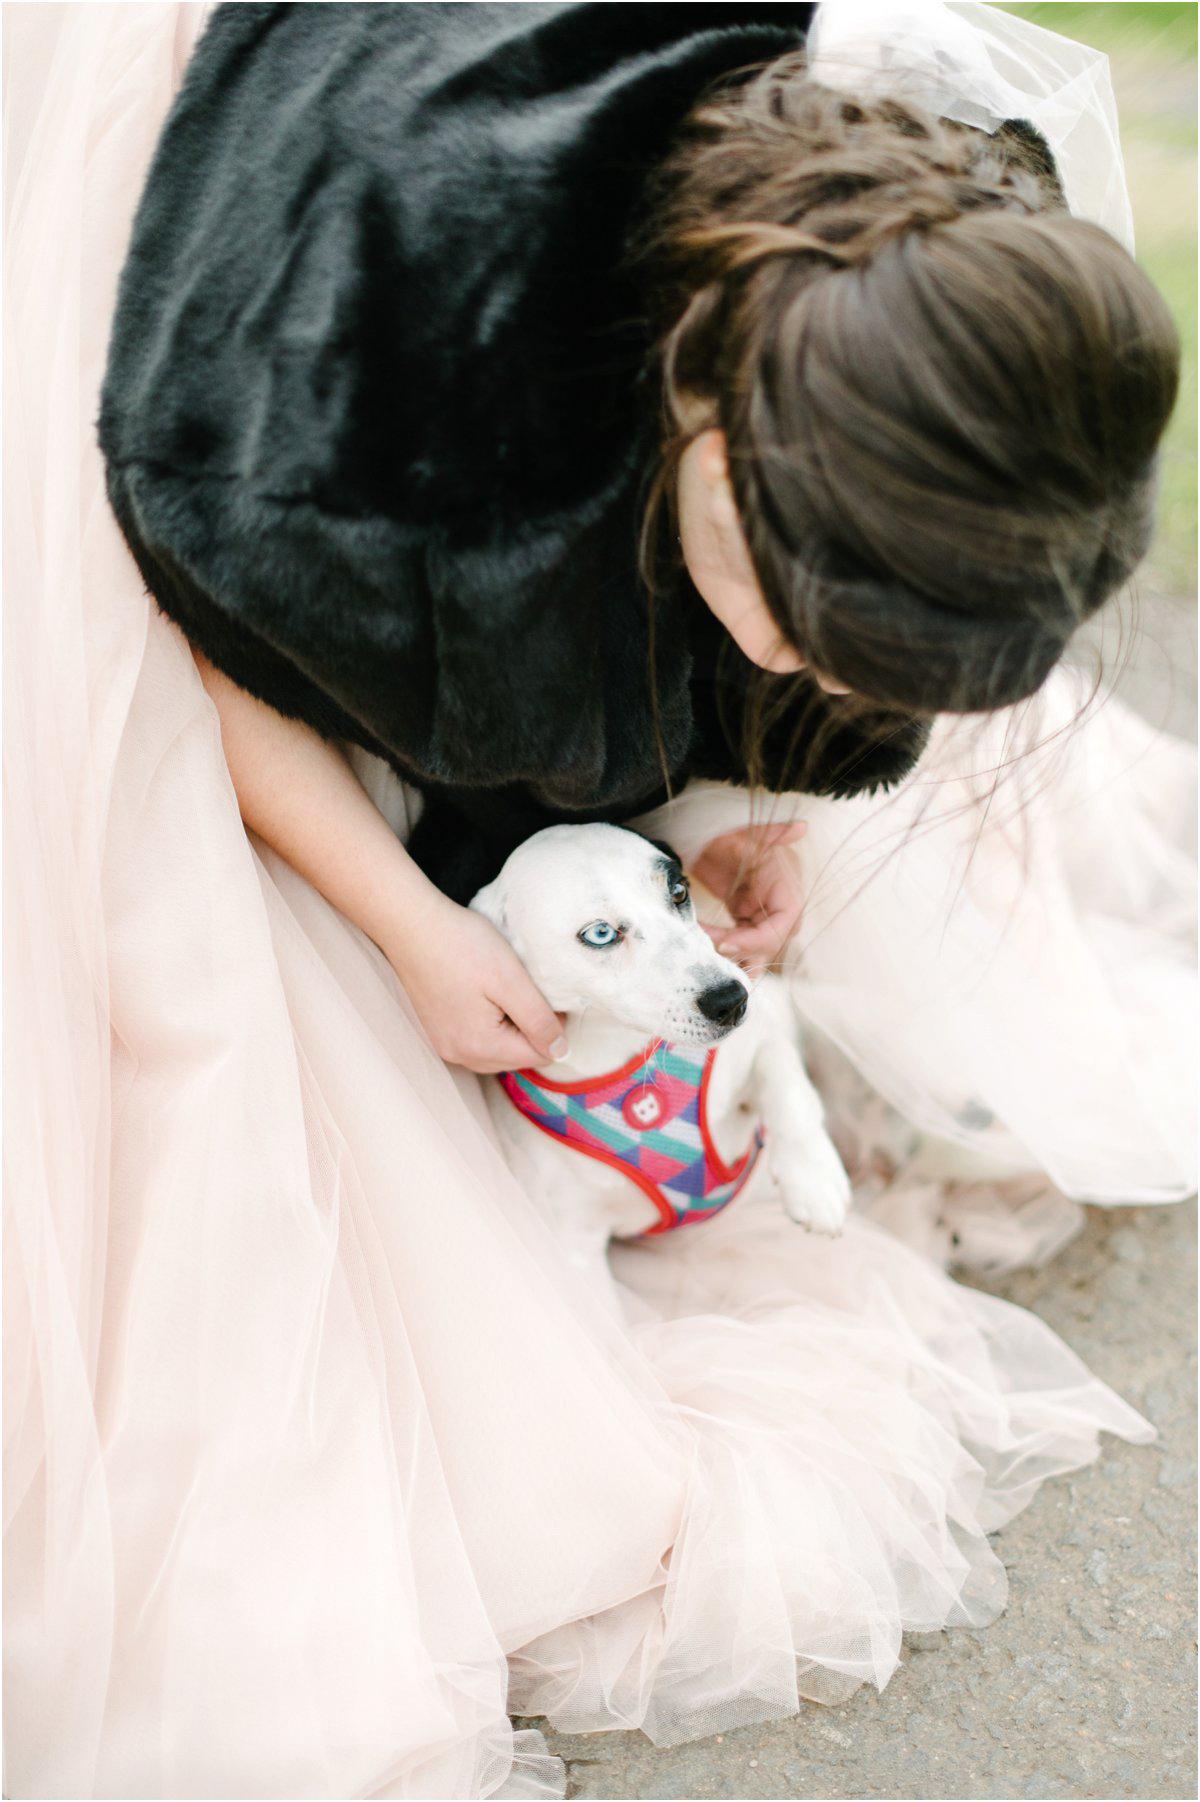 Crofts & Kowalczyk Best Wedding Photography Scotland Blogpost-153.jpg